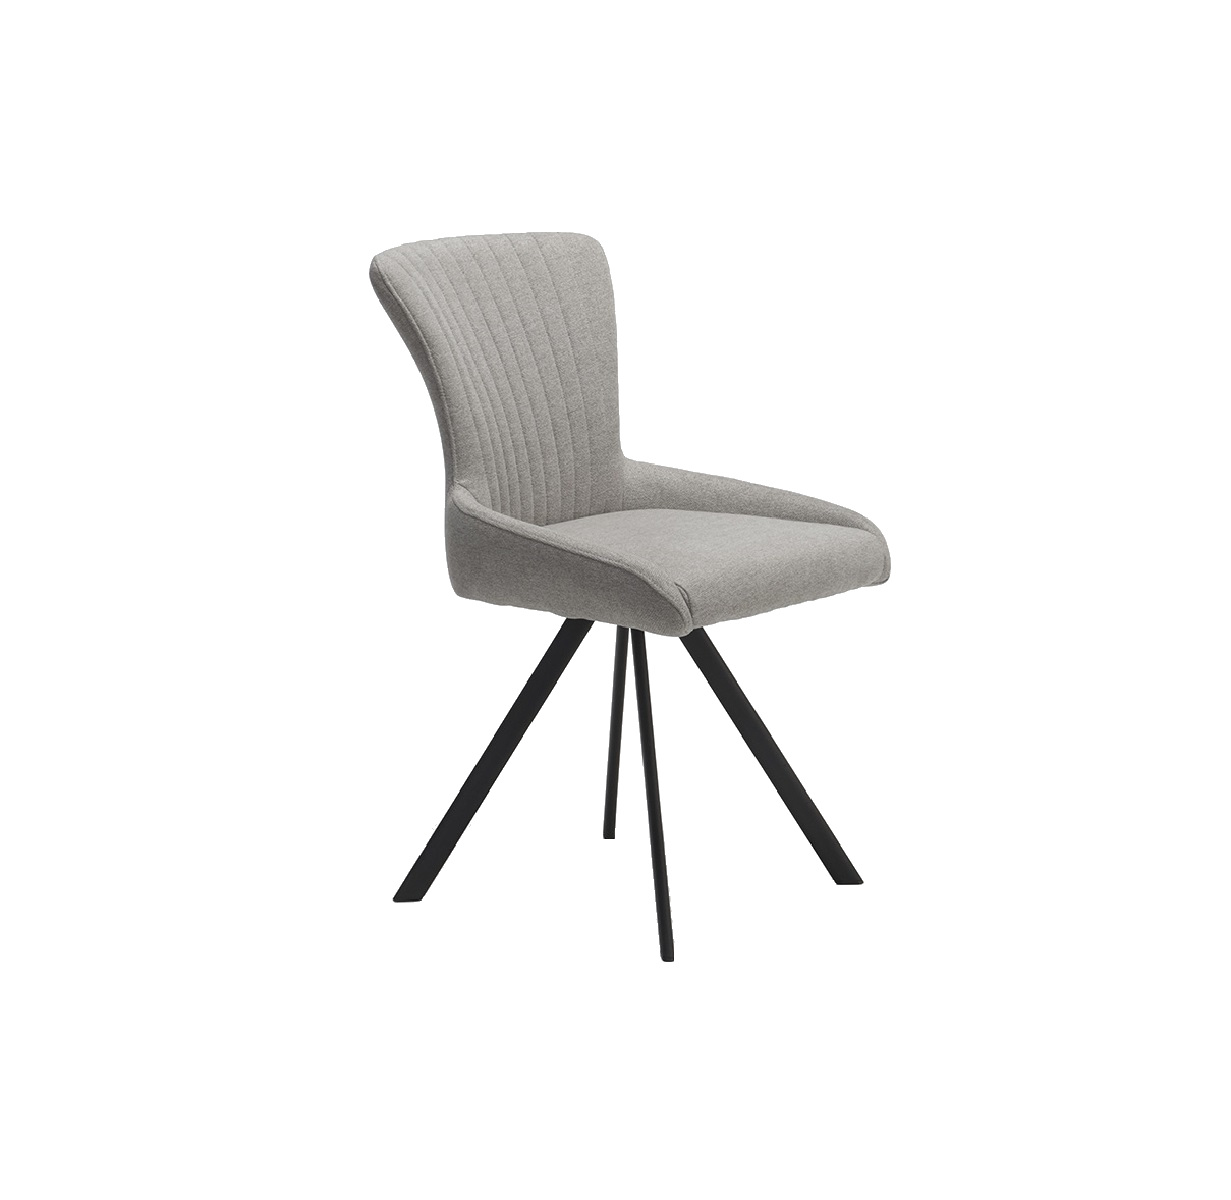 Tiffany Light Grey Swivel Chair